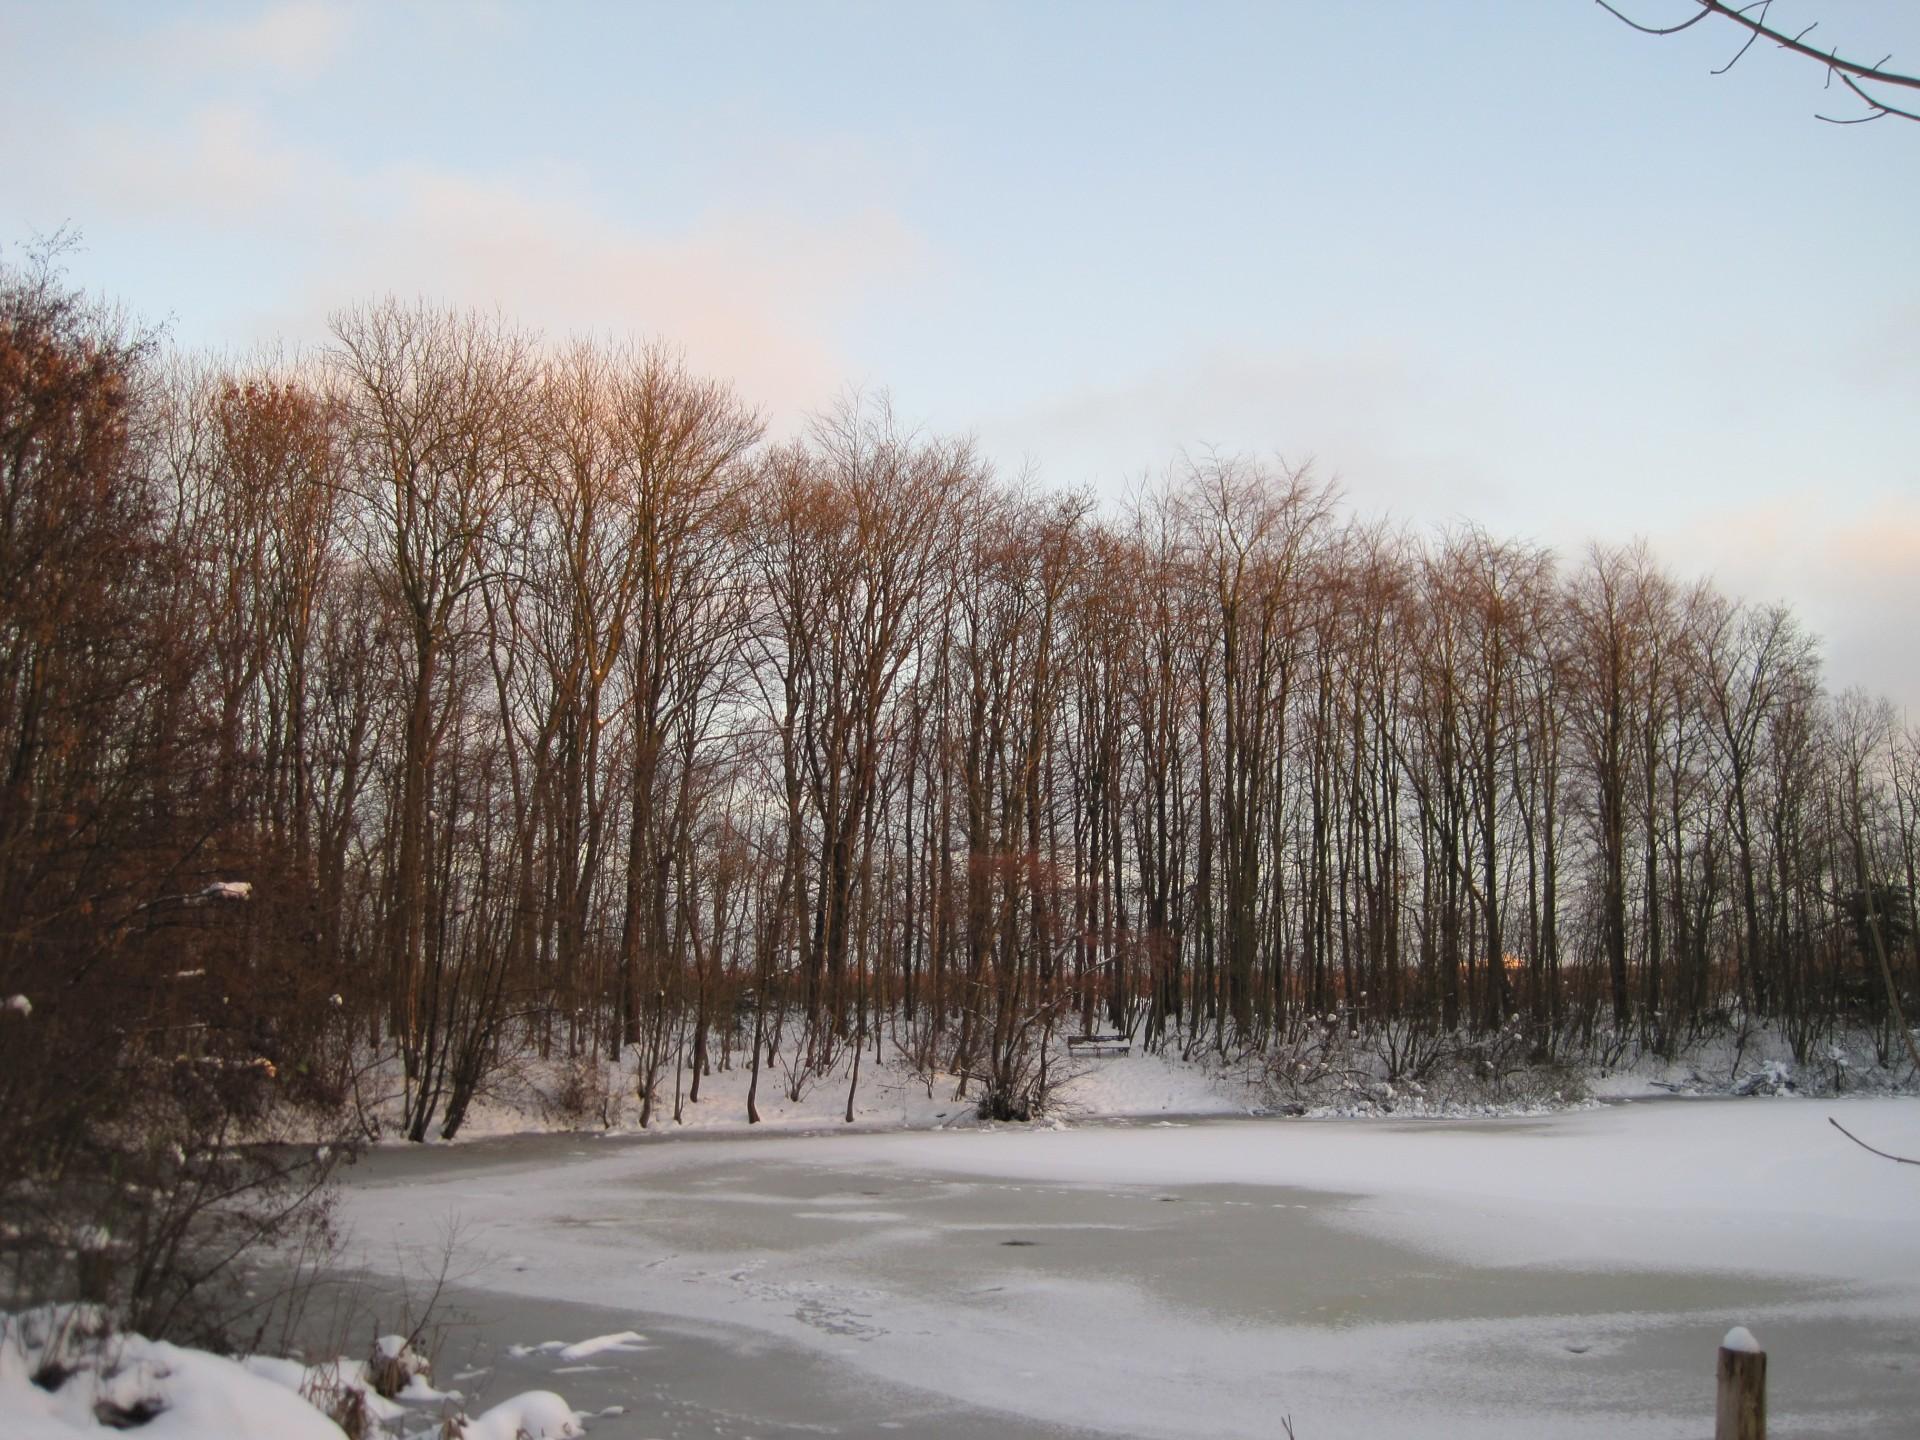 001 Vinter skov